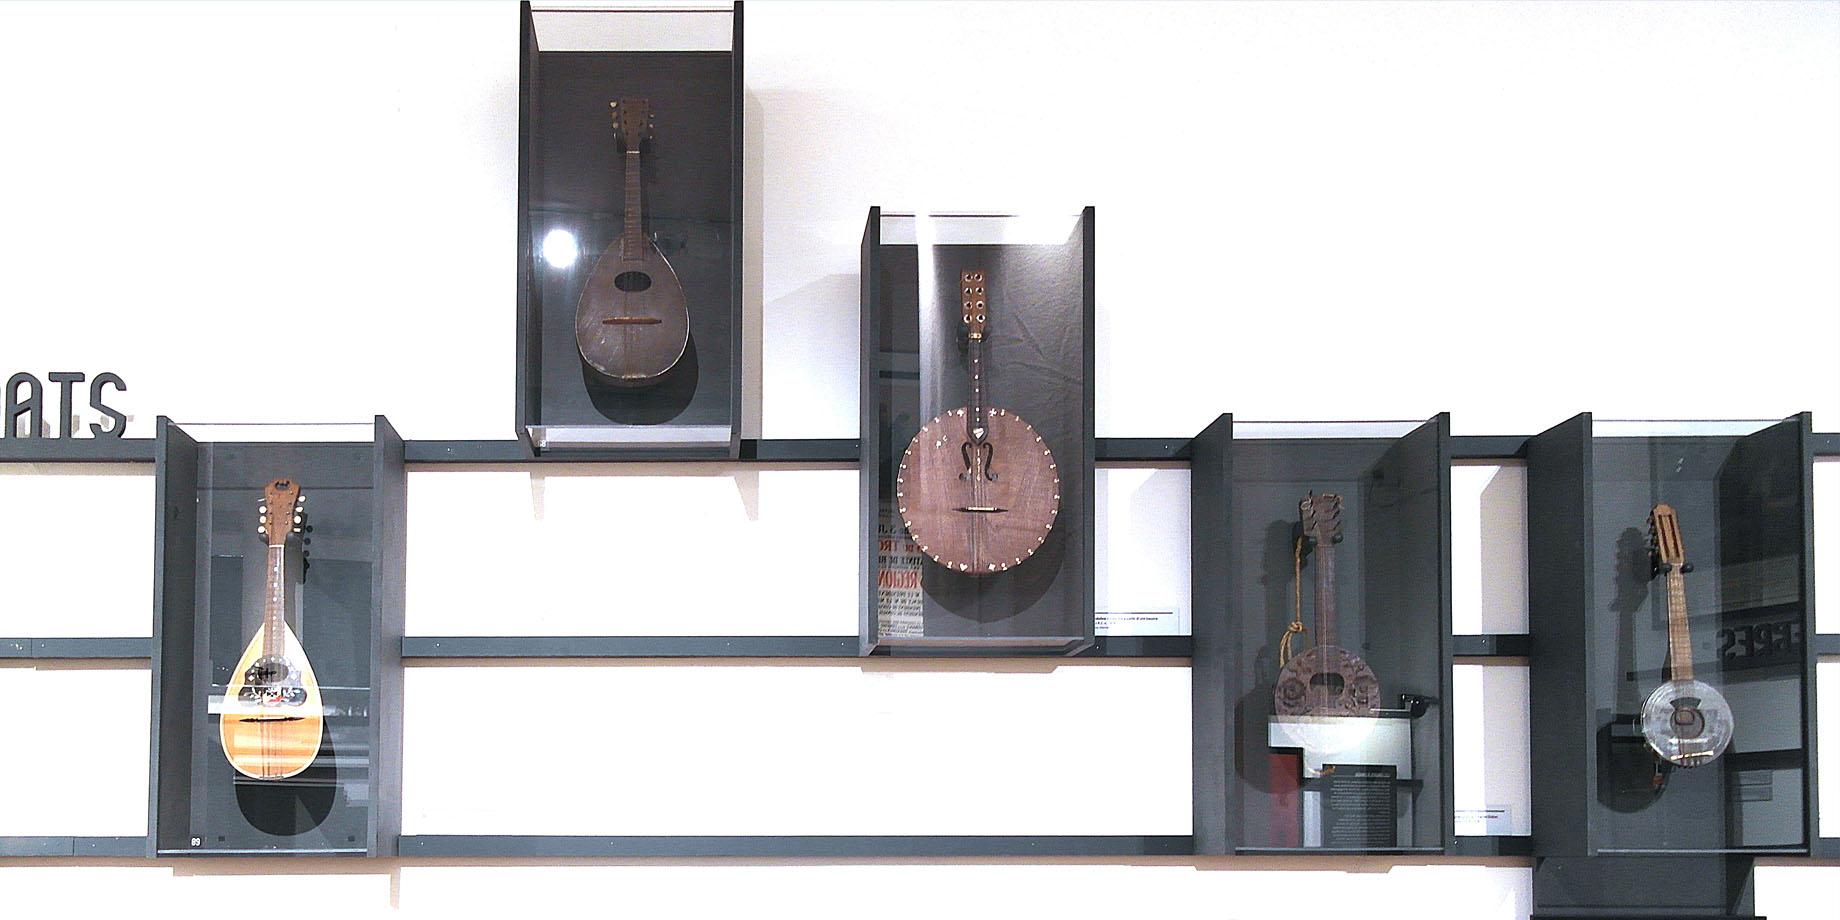 maskarade-scenographie-exposition-temporaire-memoriale-guerre-perrone-instruments-musique